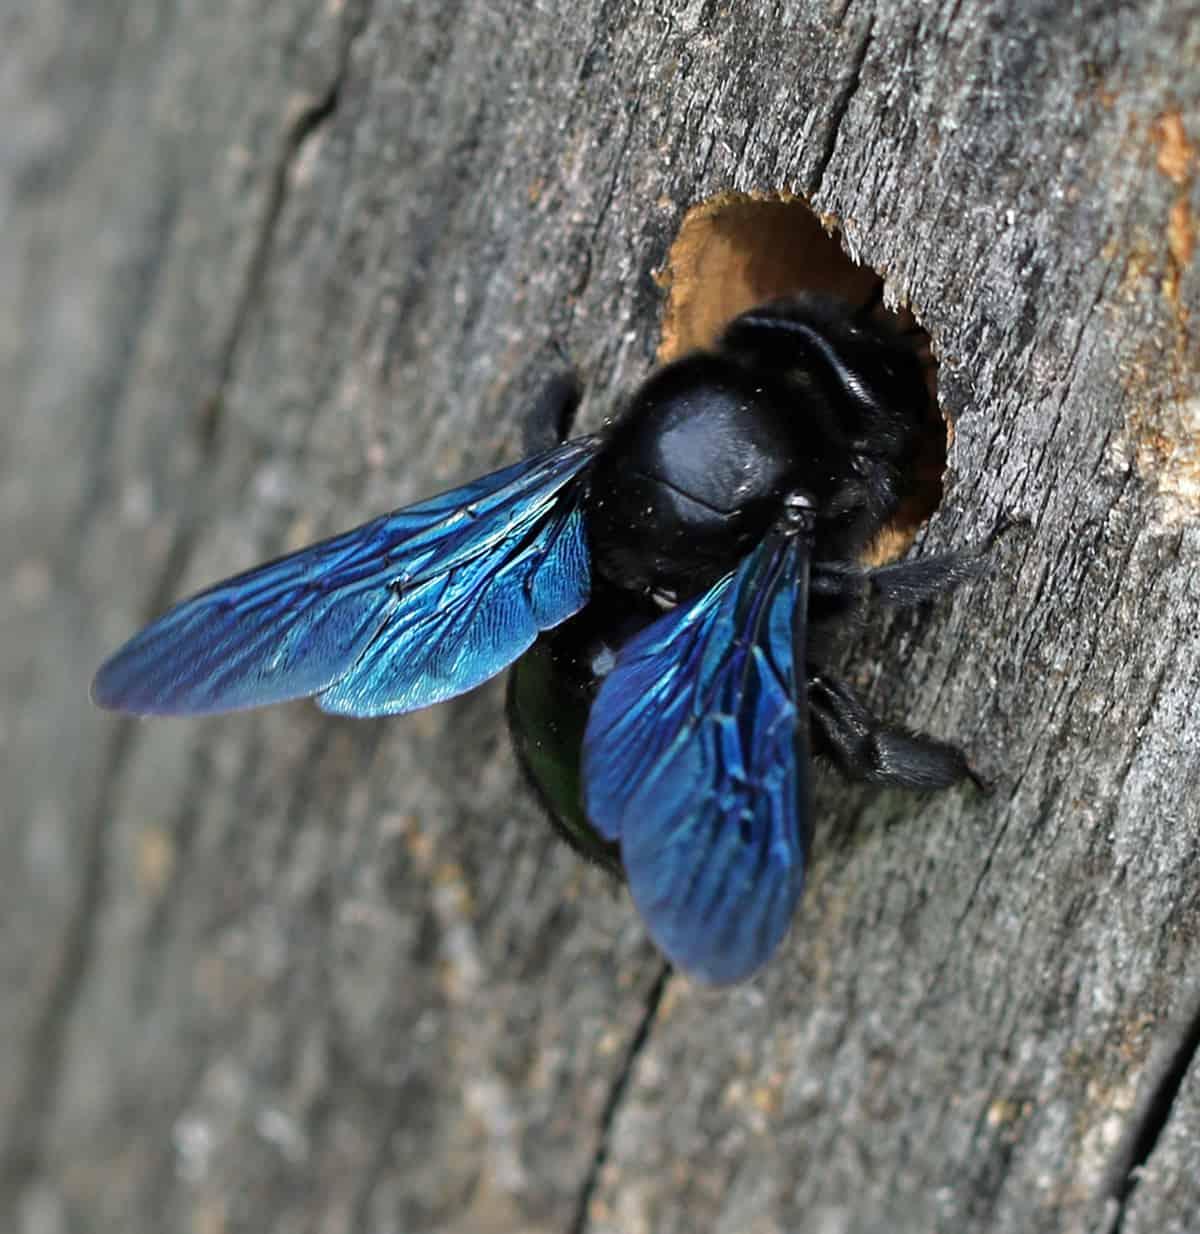 Blaue Holzbiene nagt sich einen Gang ins Holz